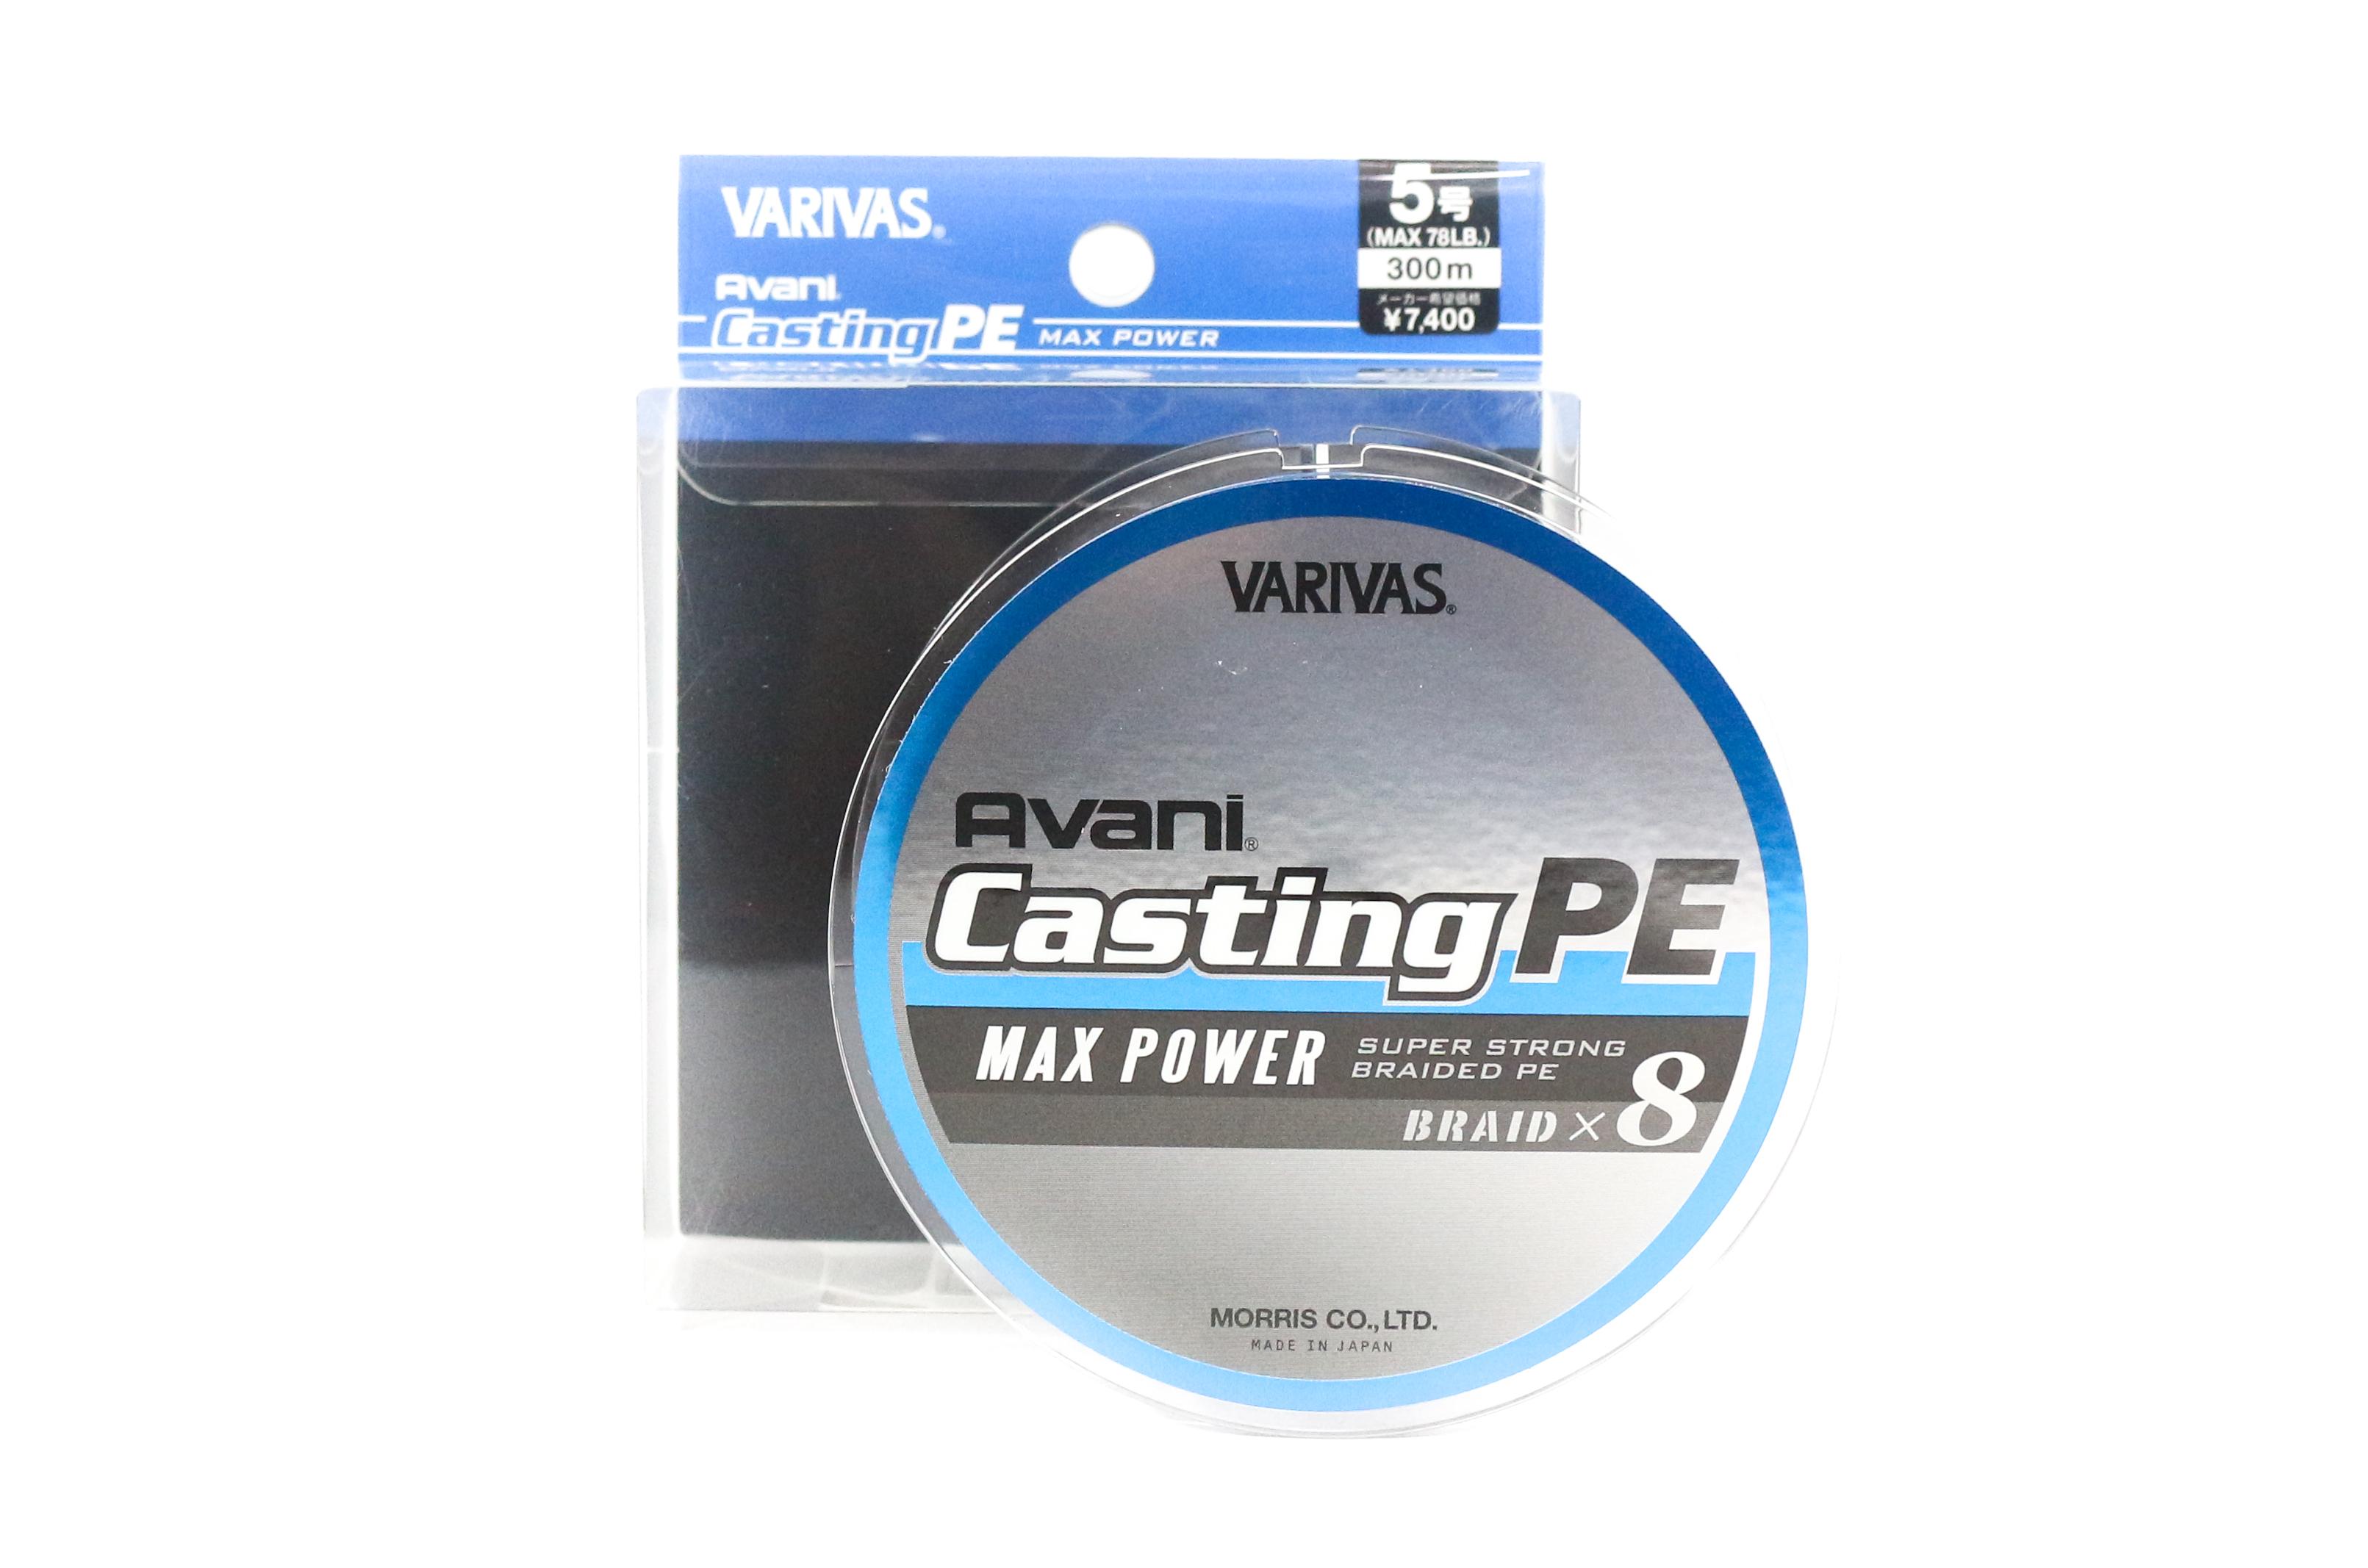 Sale Varivas P.E Line New Avani Max Power Casting 300m P.E 5 78lb (9610)